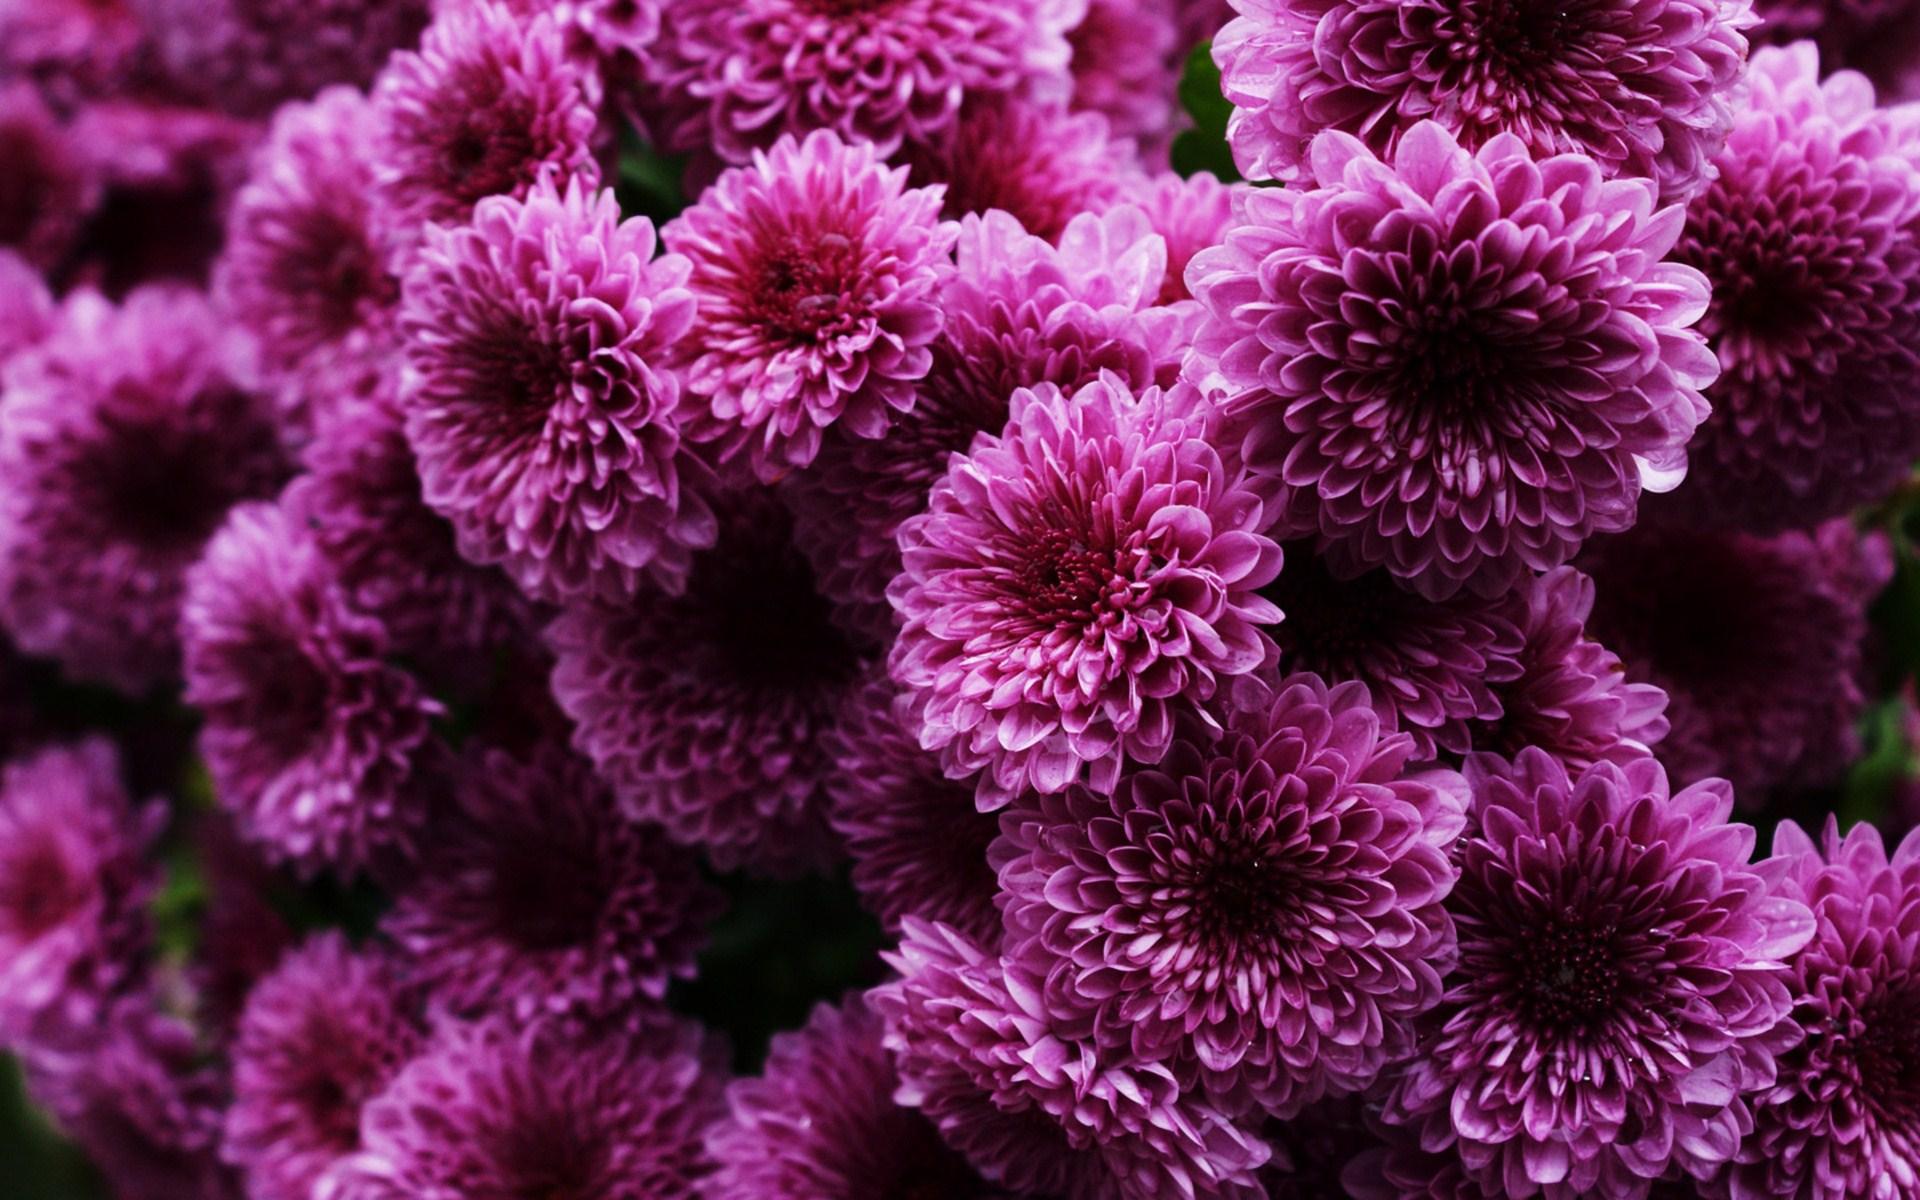 Stunning Chrysanthemums Wallpaper 35295 1920x1200 px